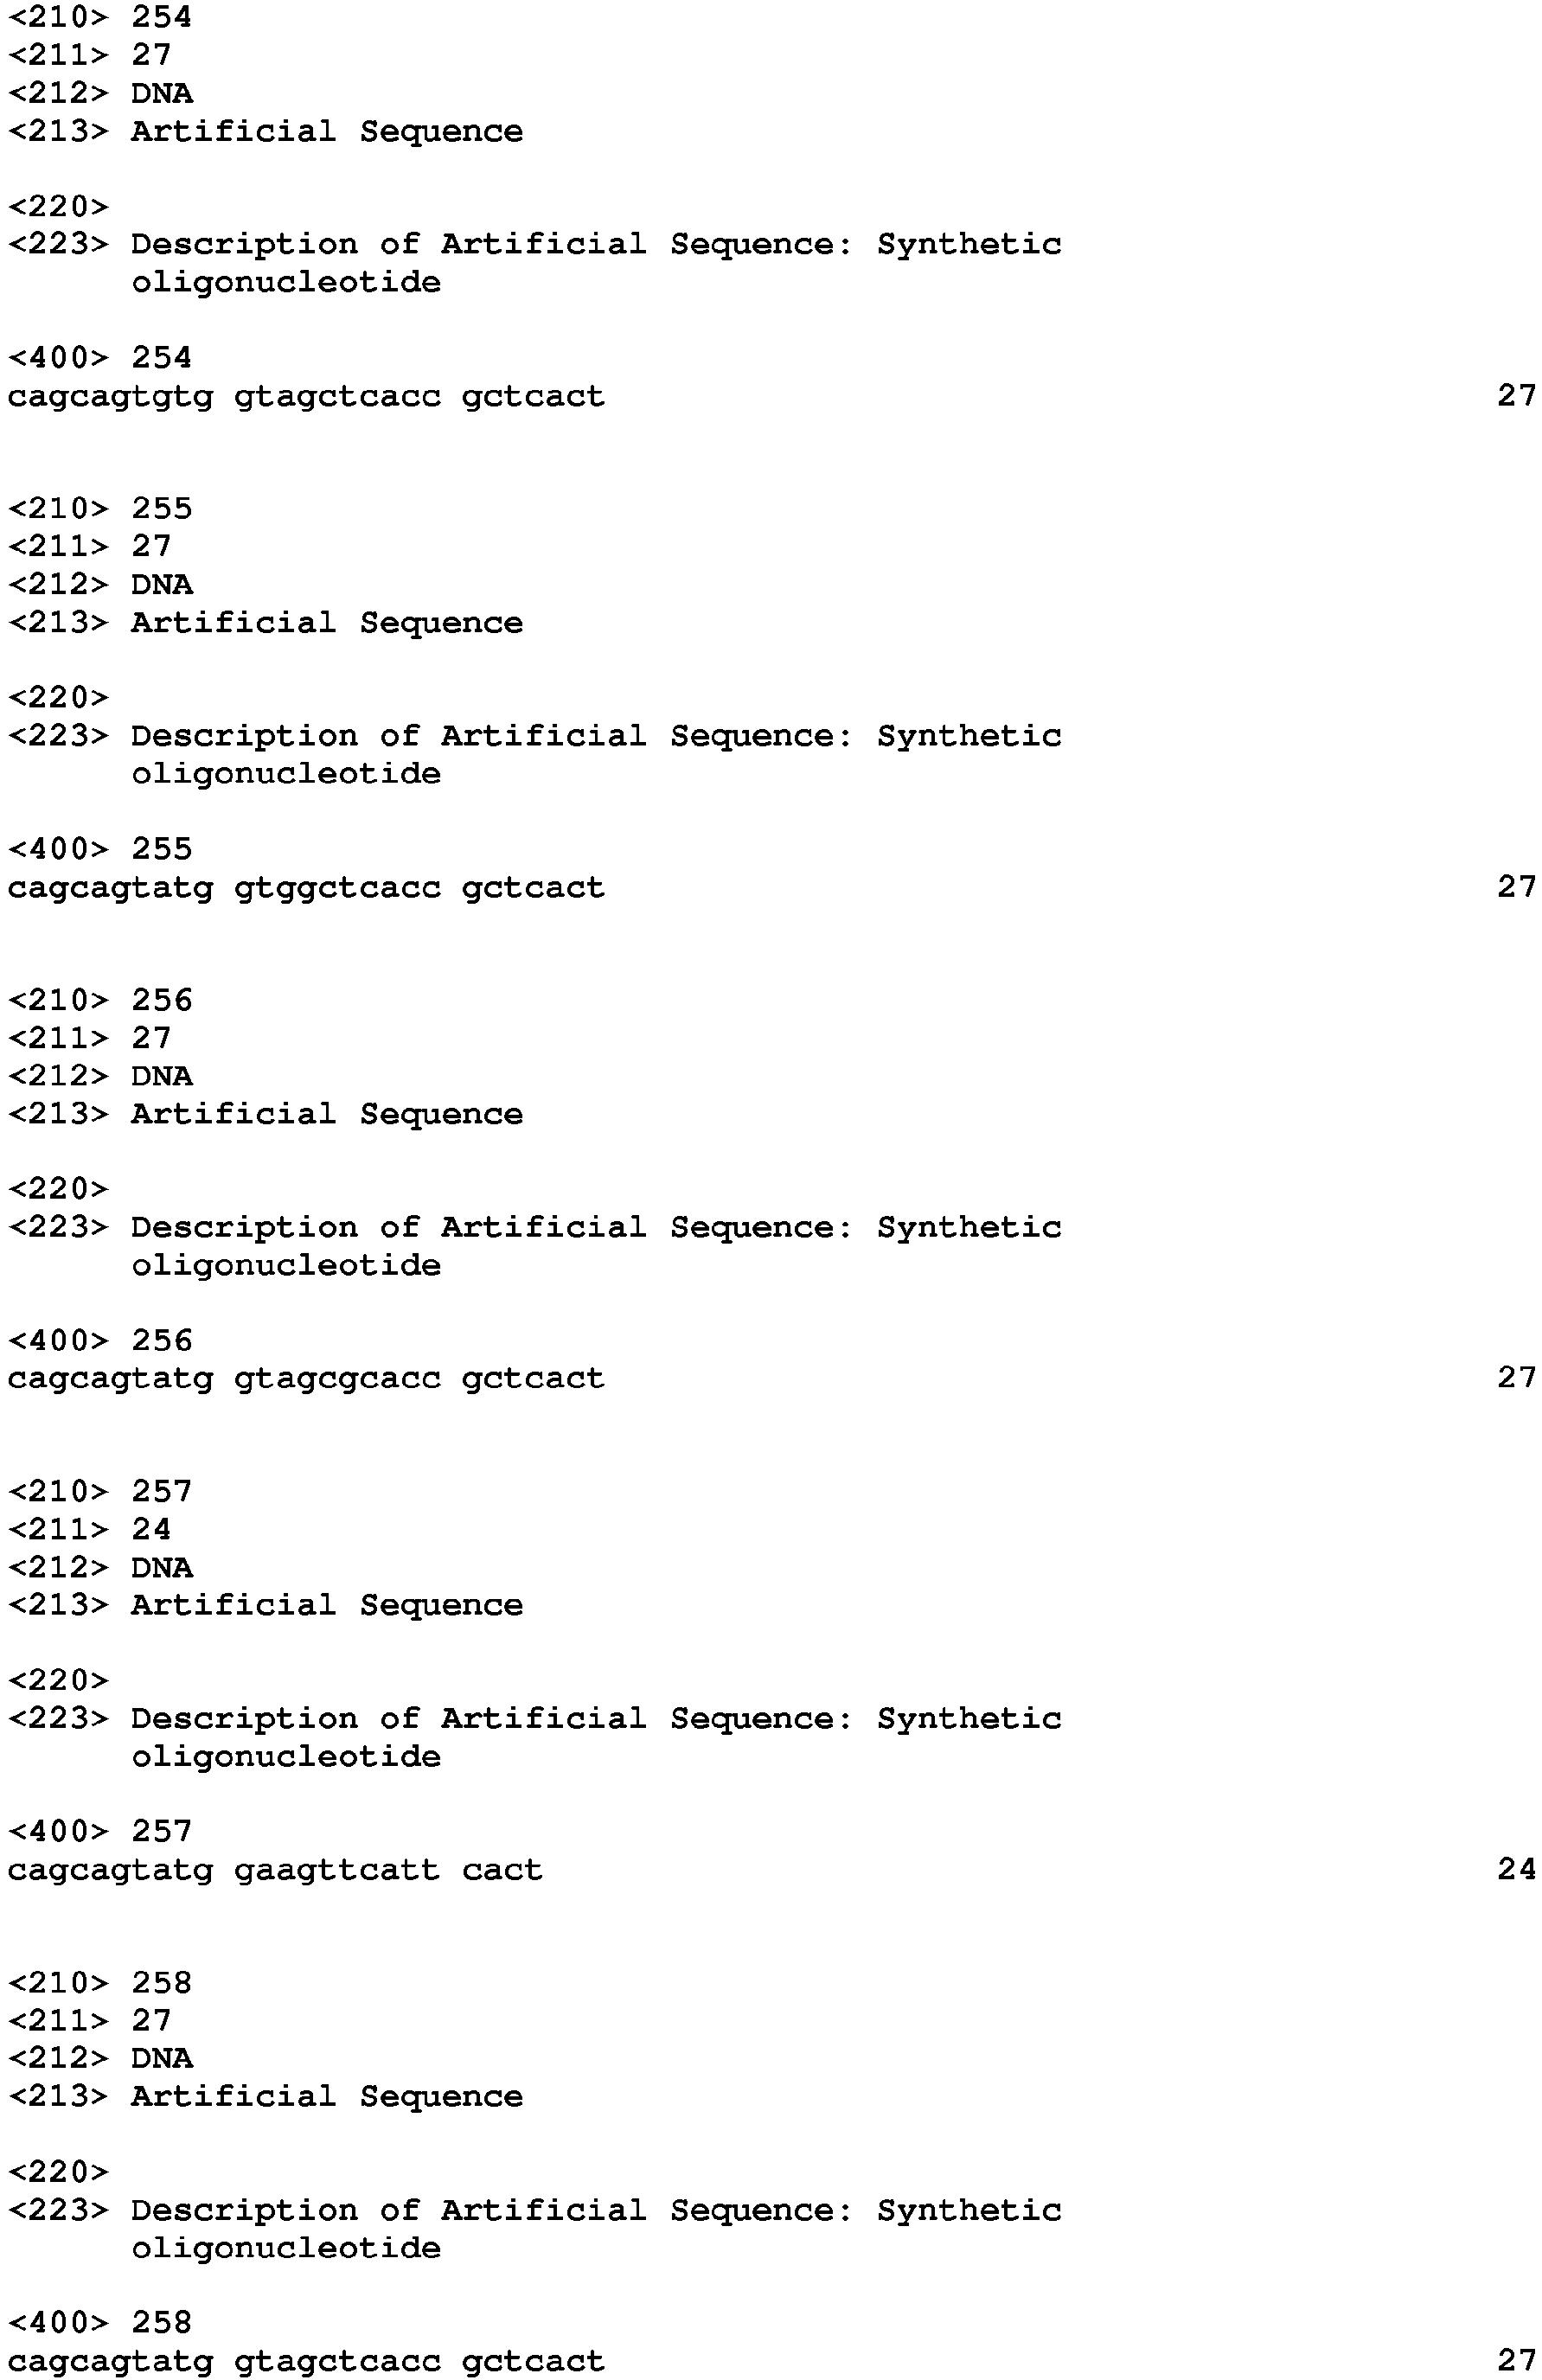 Figure imgb0580